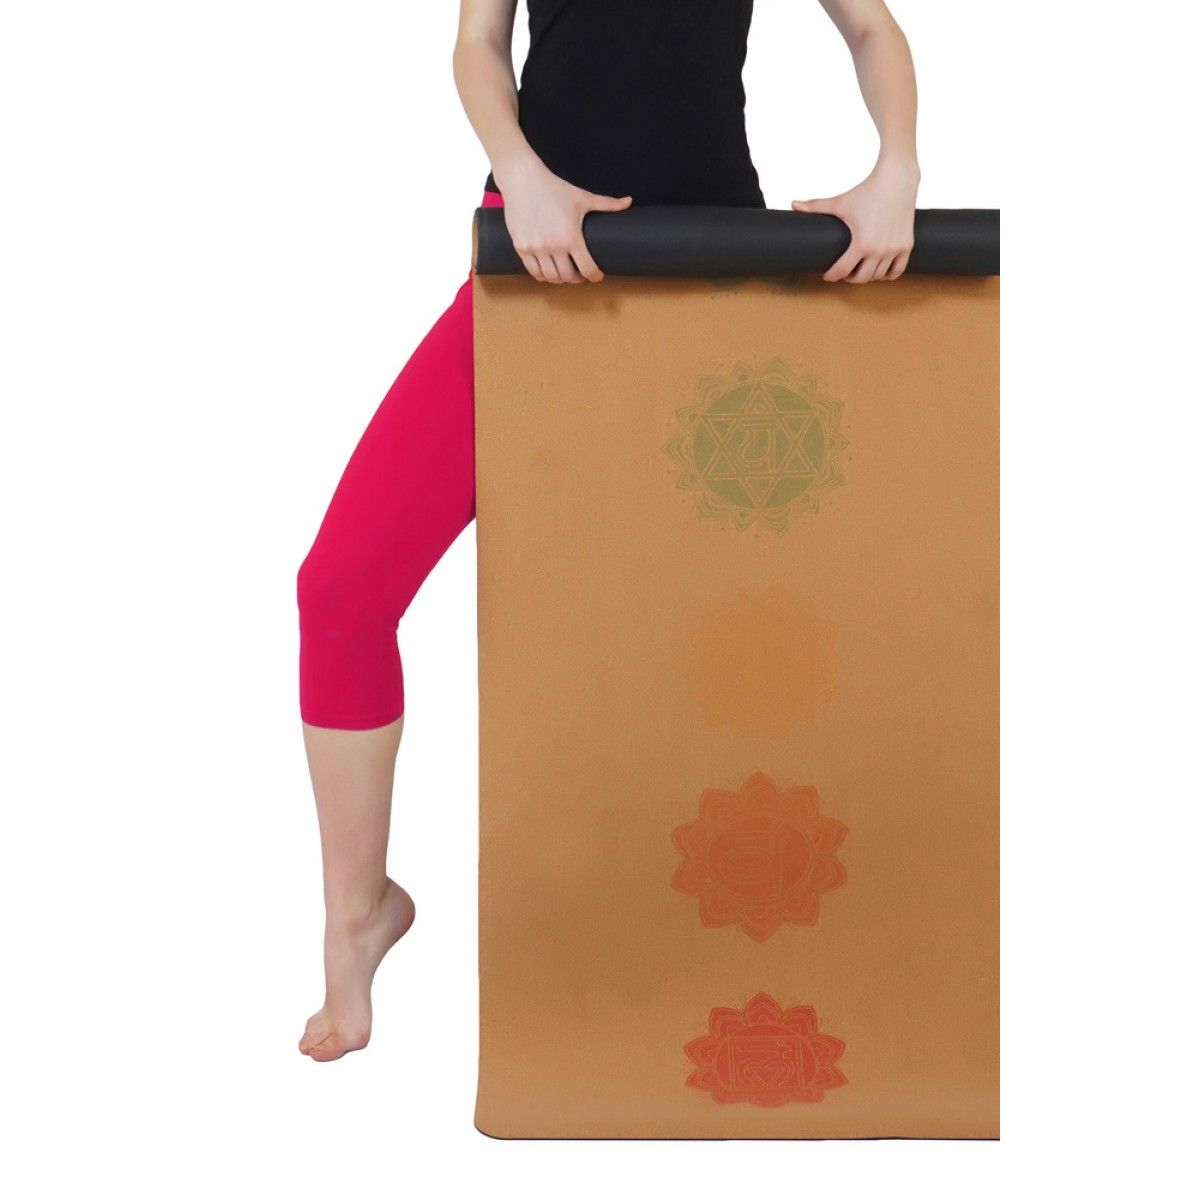 Yoga Mats In Bulk